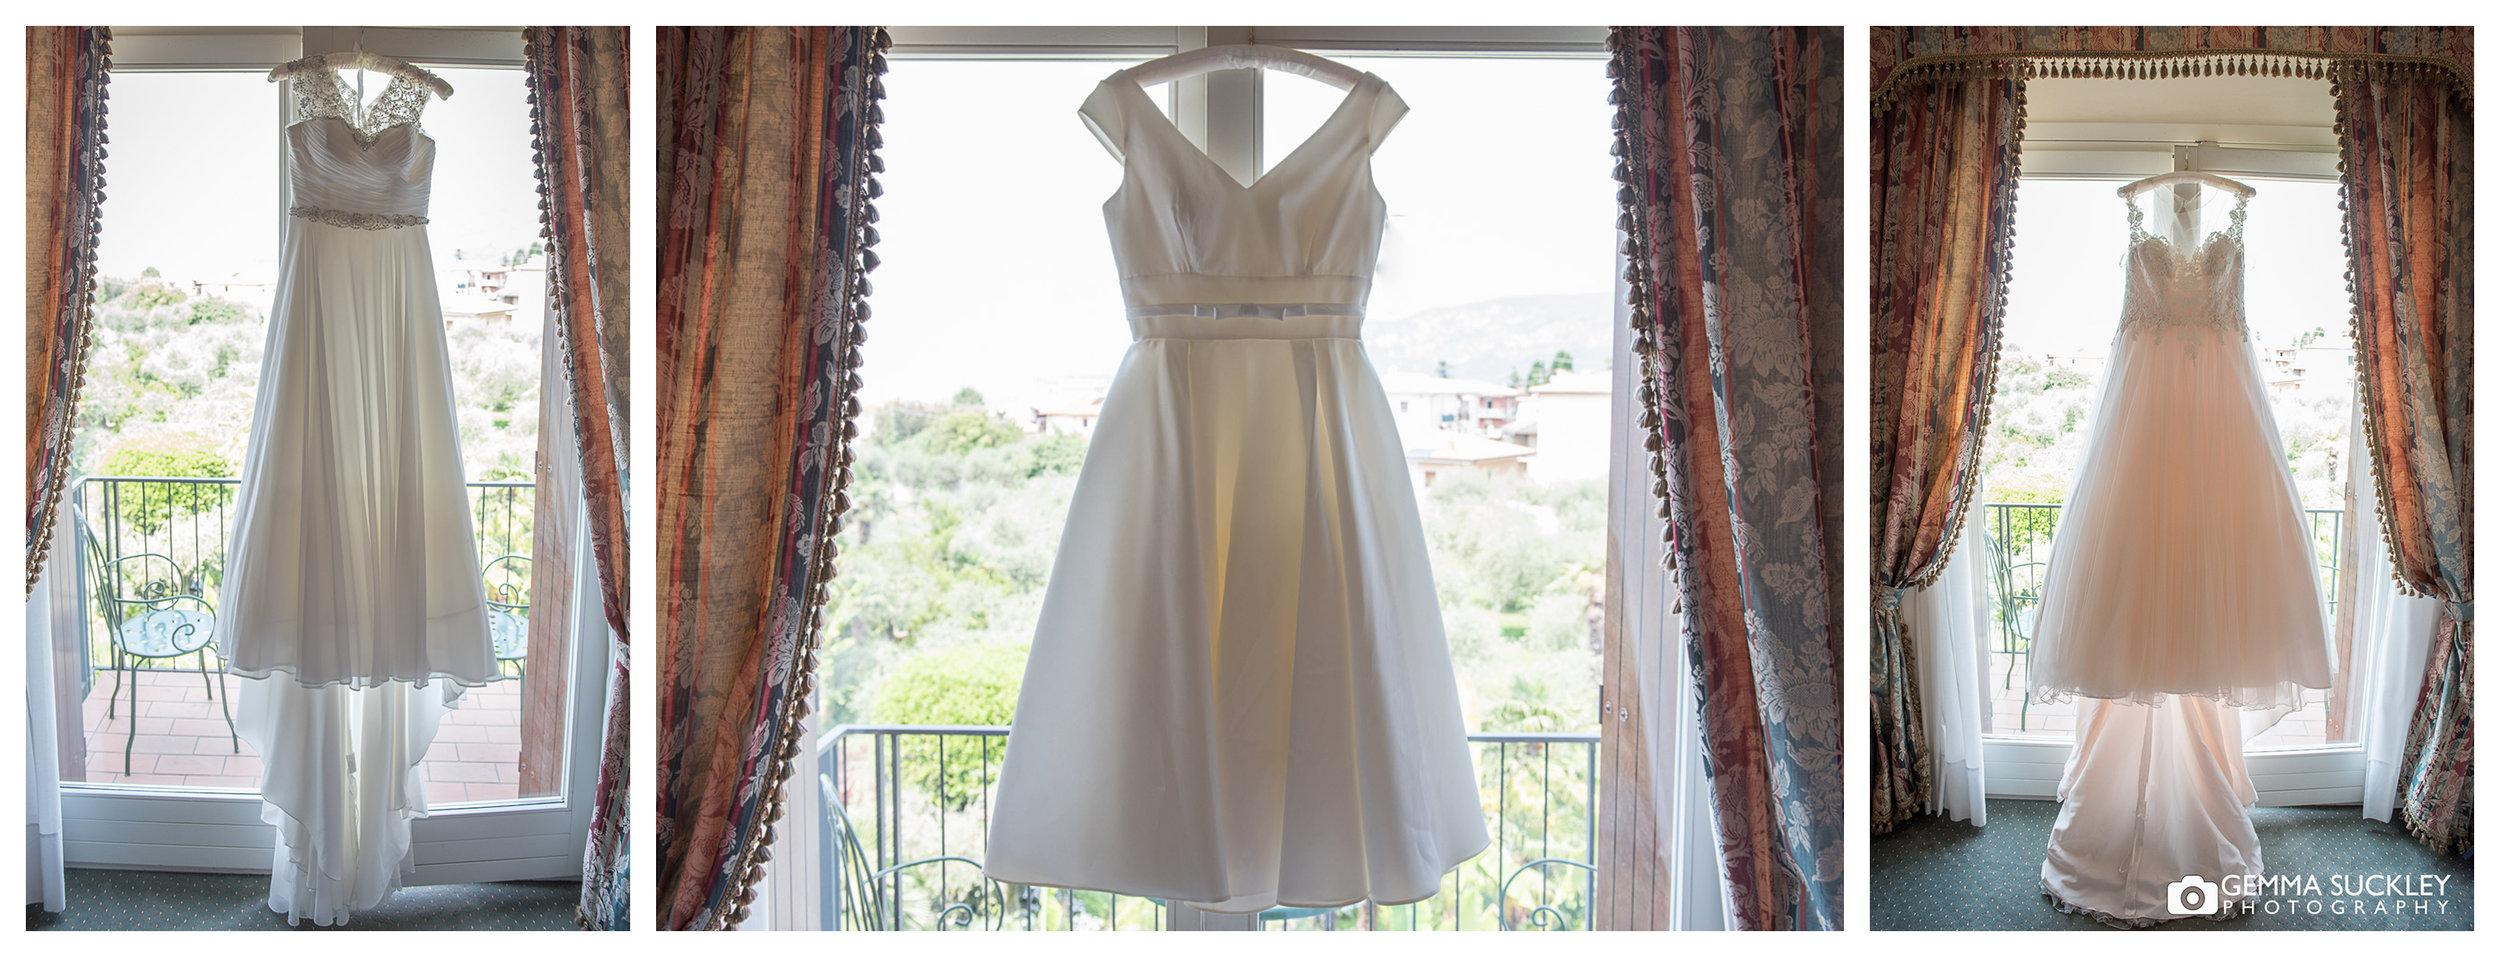 three wedding dresses hanging